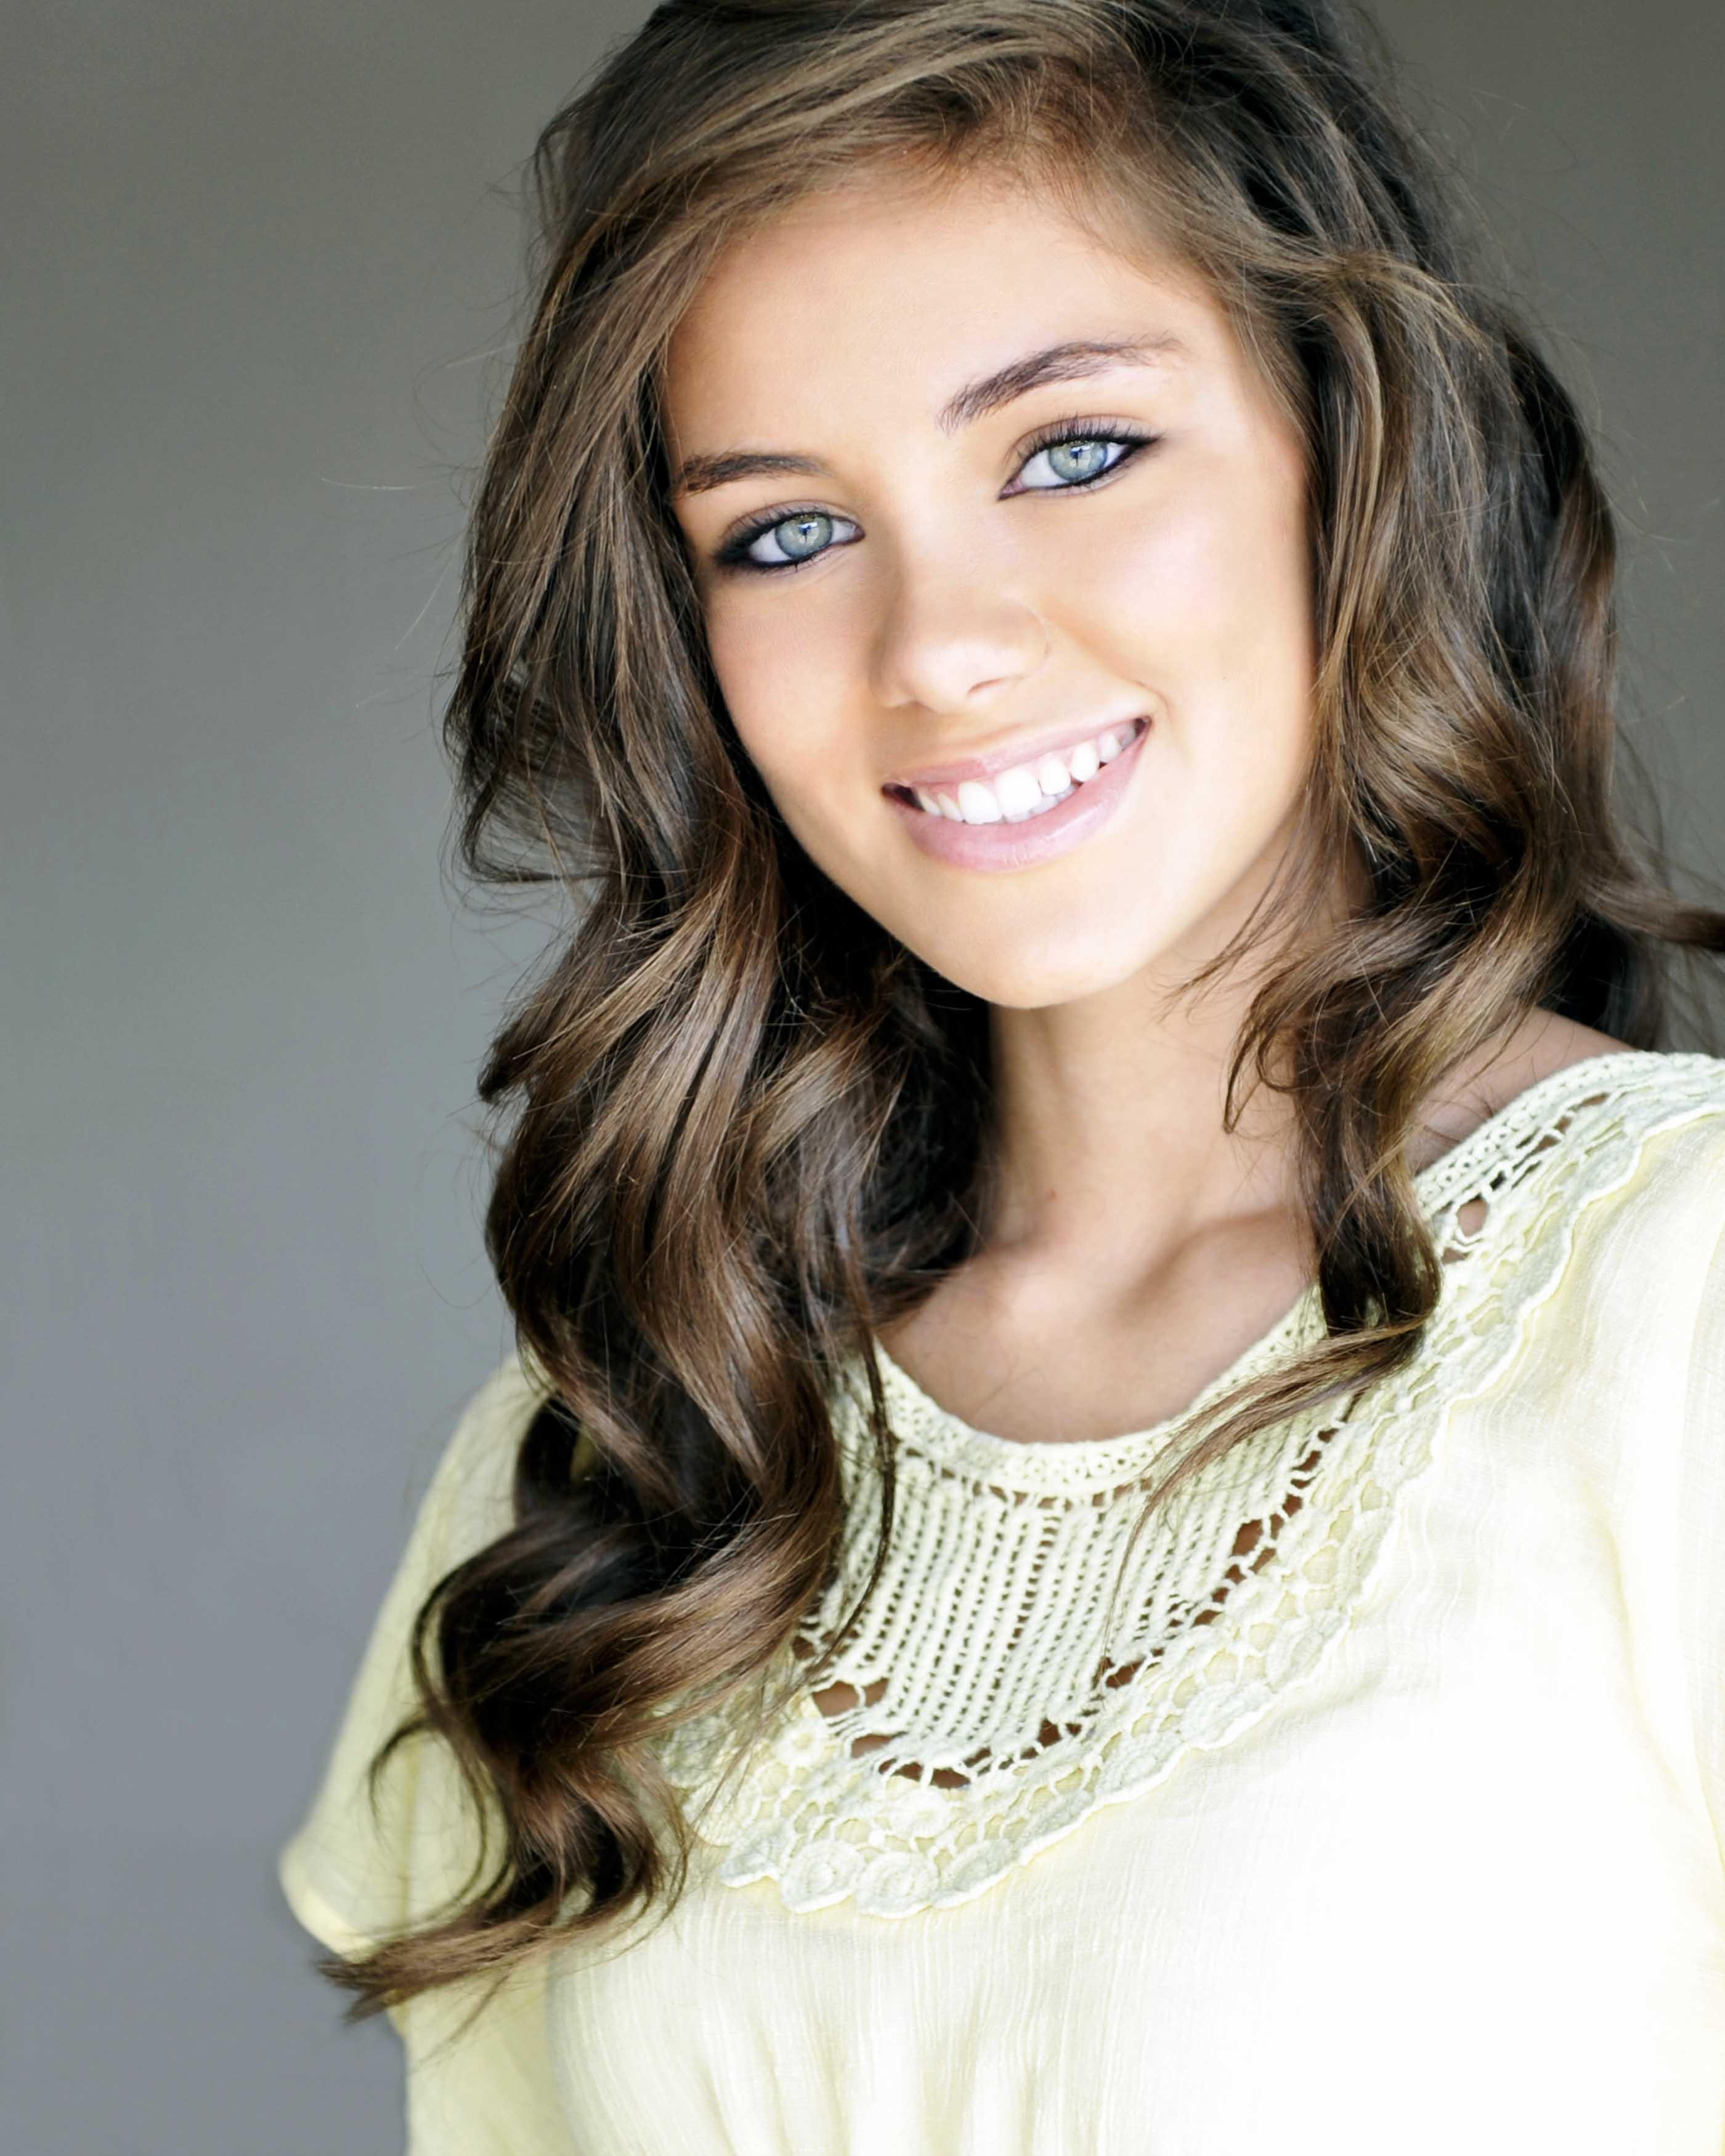 Miss Idaho Teen USA 2013 Contestants